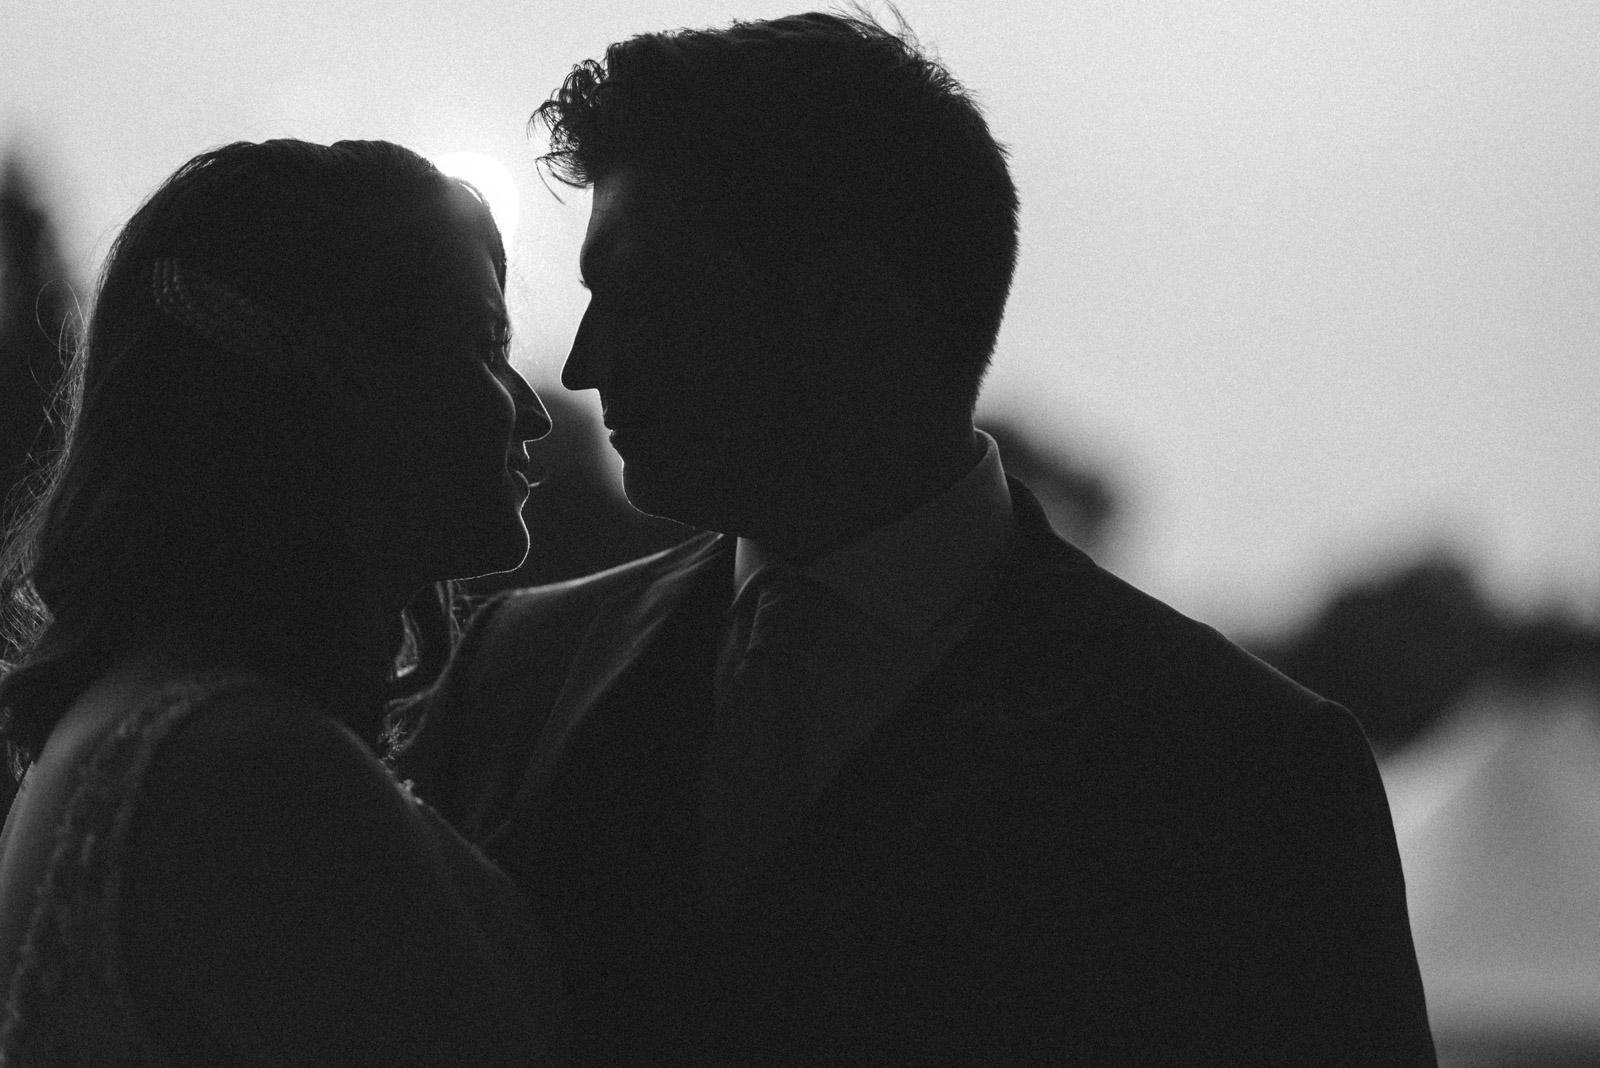 Emerson & Elicia's Golf Course Wedding Aidan & Leanne Hennebry Hamilton Wedding Videographers Photographers Niagara Hush Hush Photography & Film-65.jpg